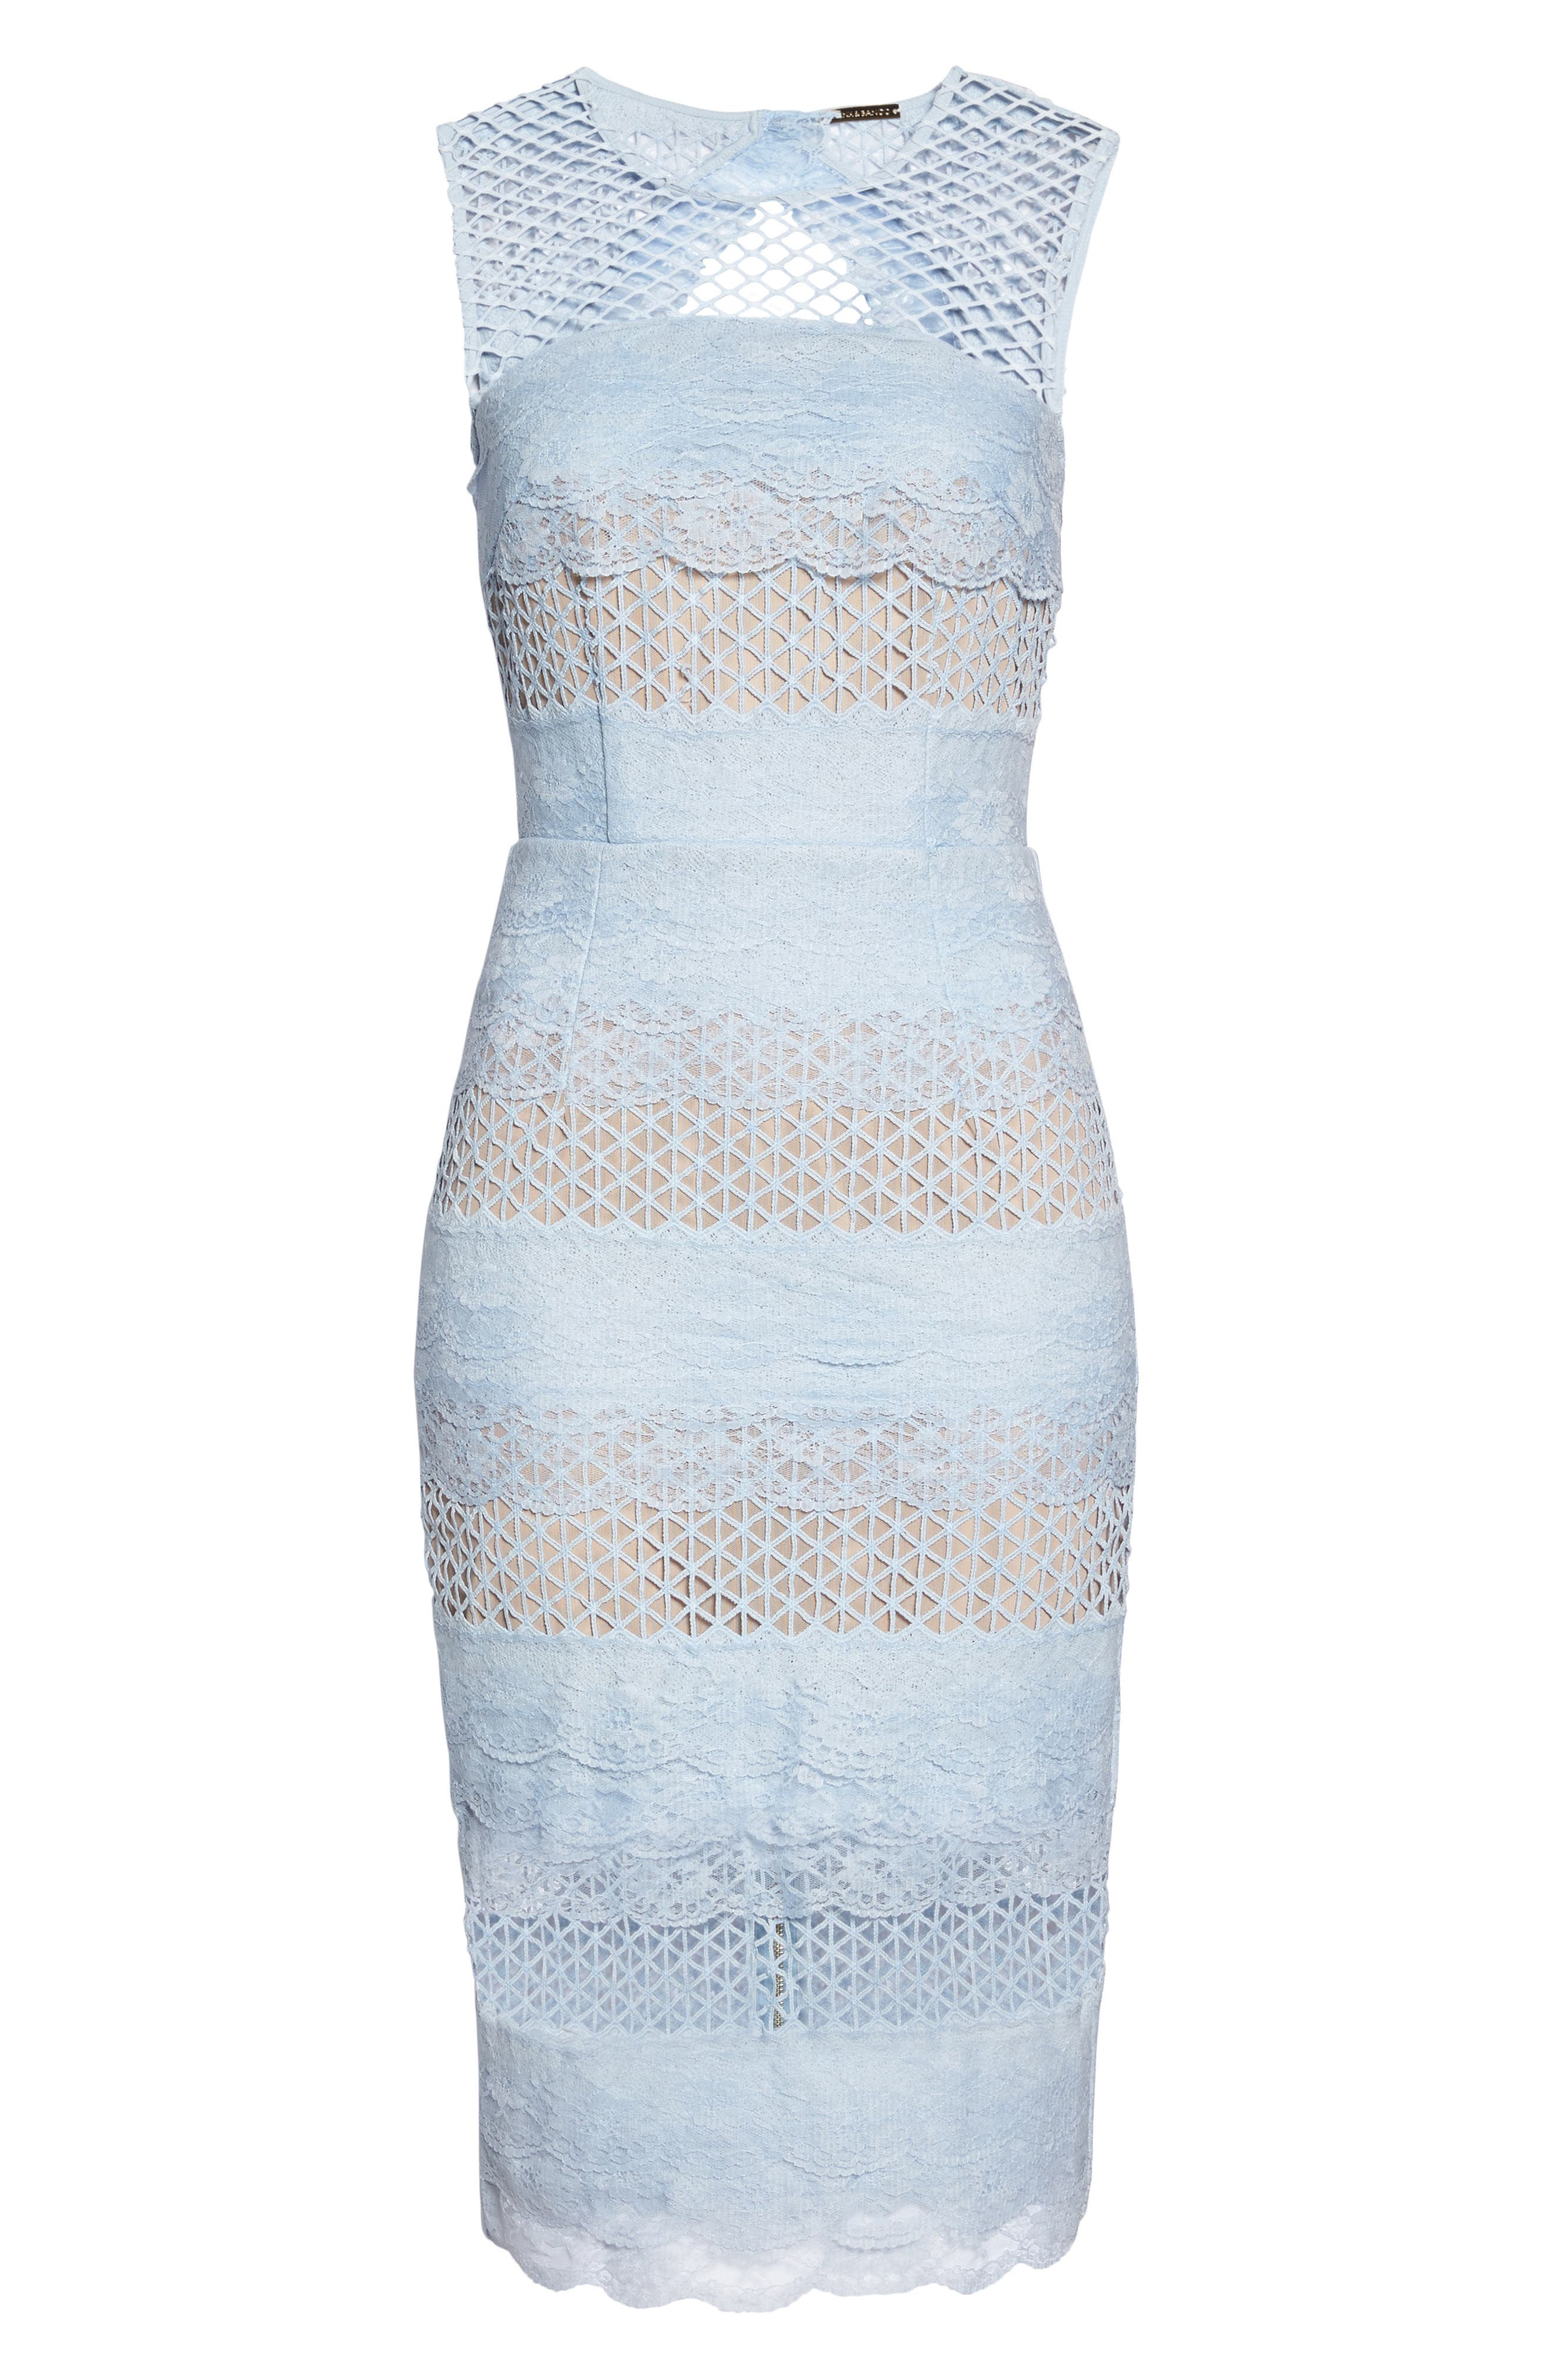 Sienna Lace Panel Sheath Dress,                             Alternate thumbnail 6, color,